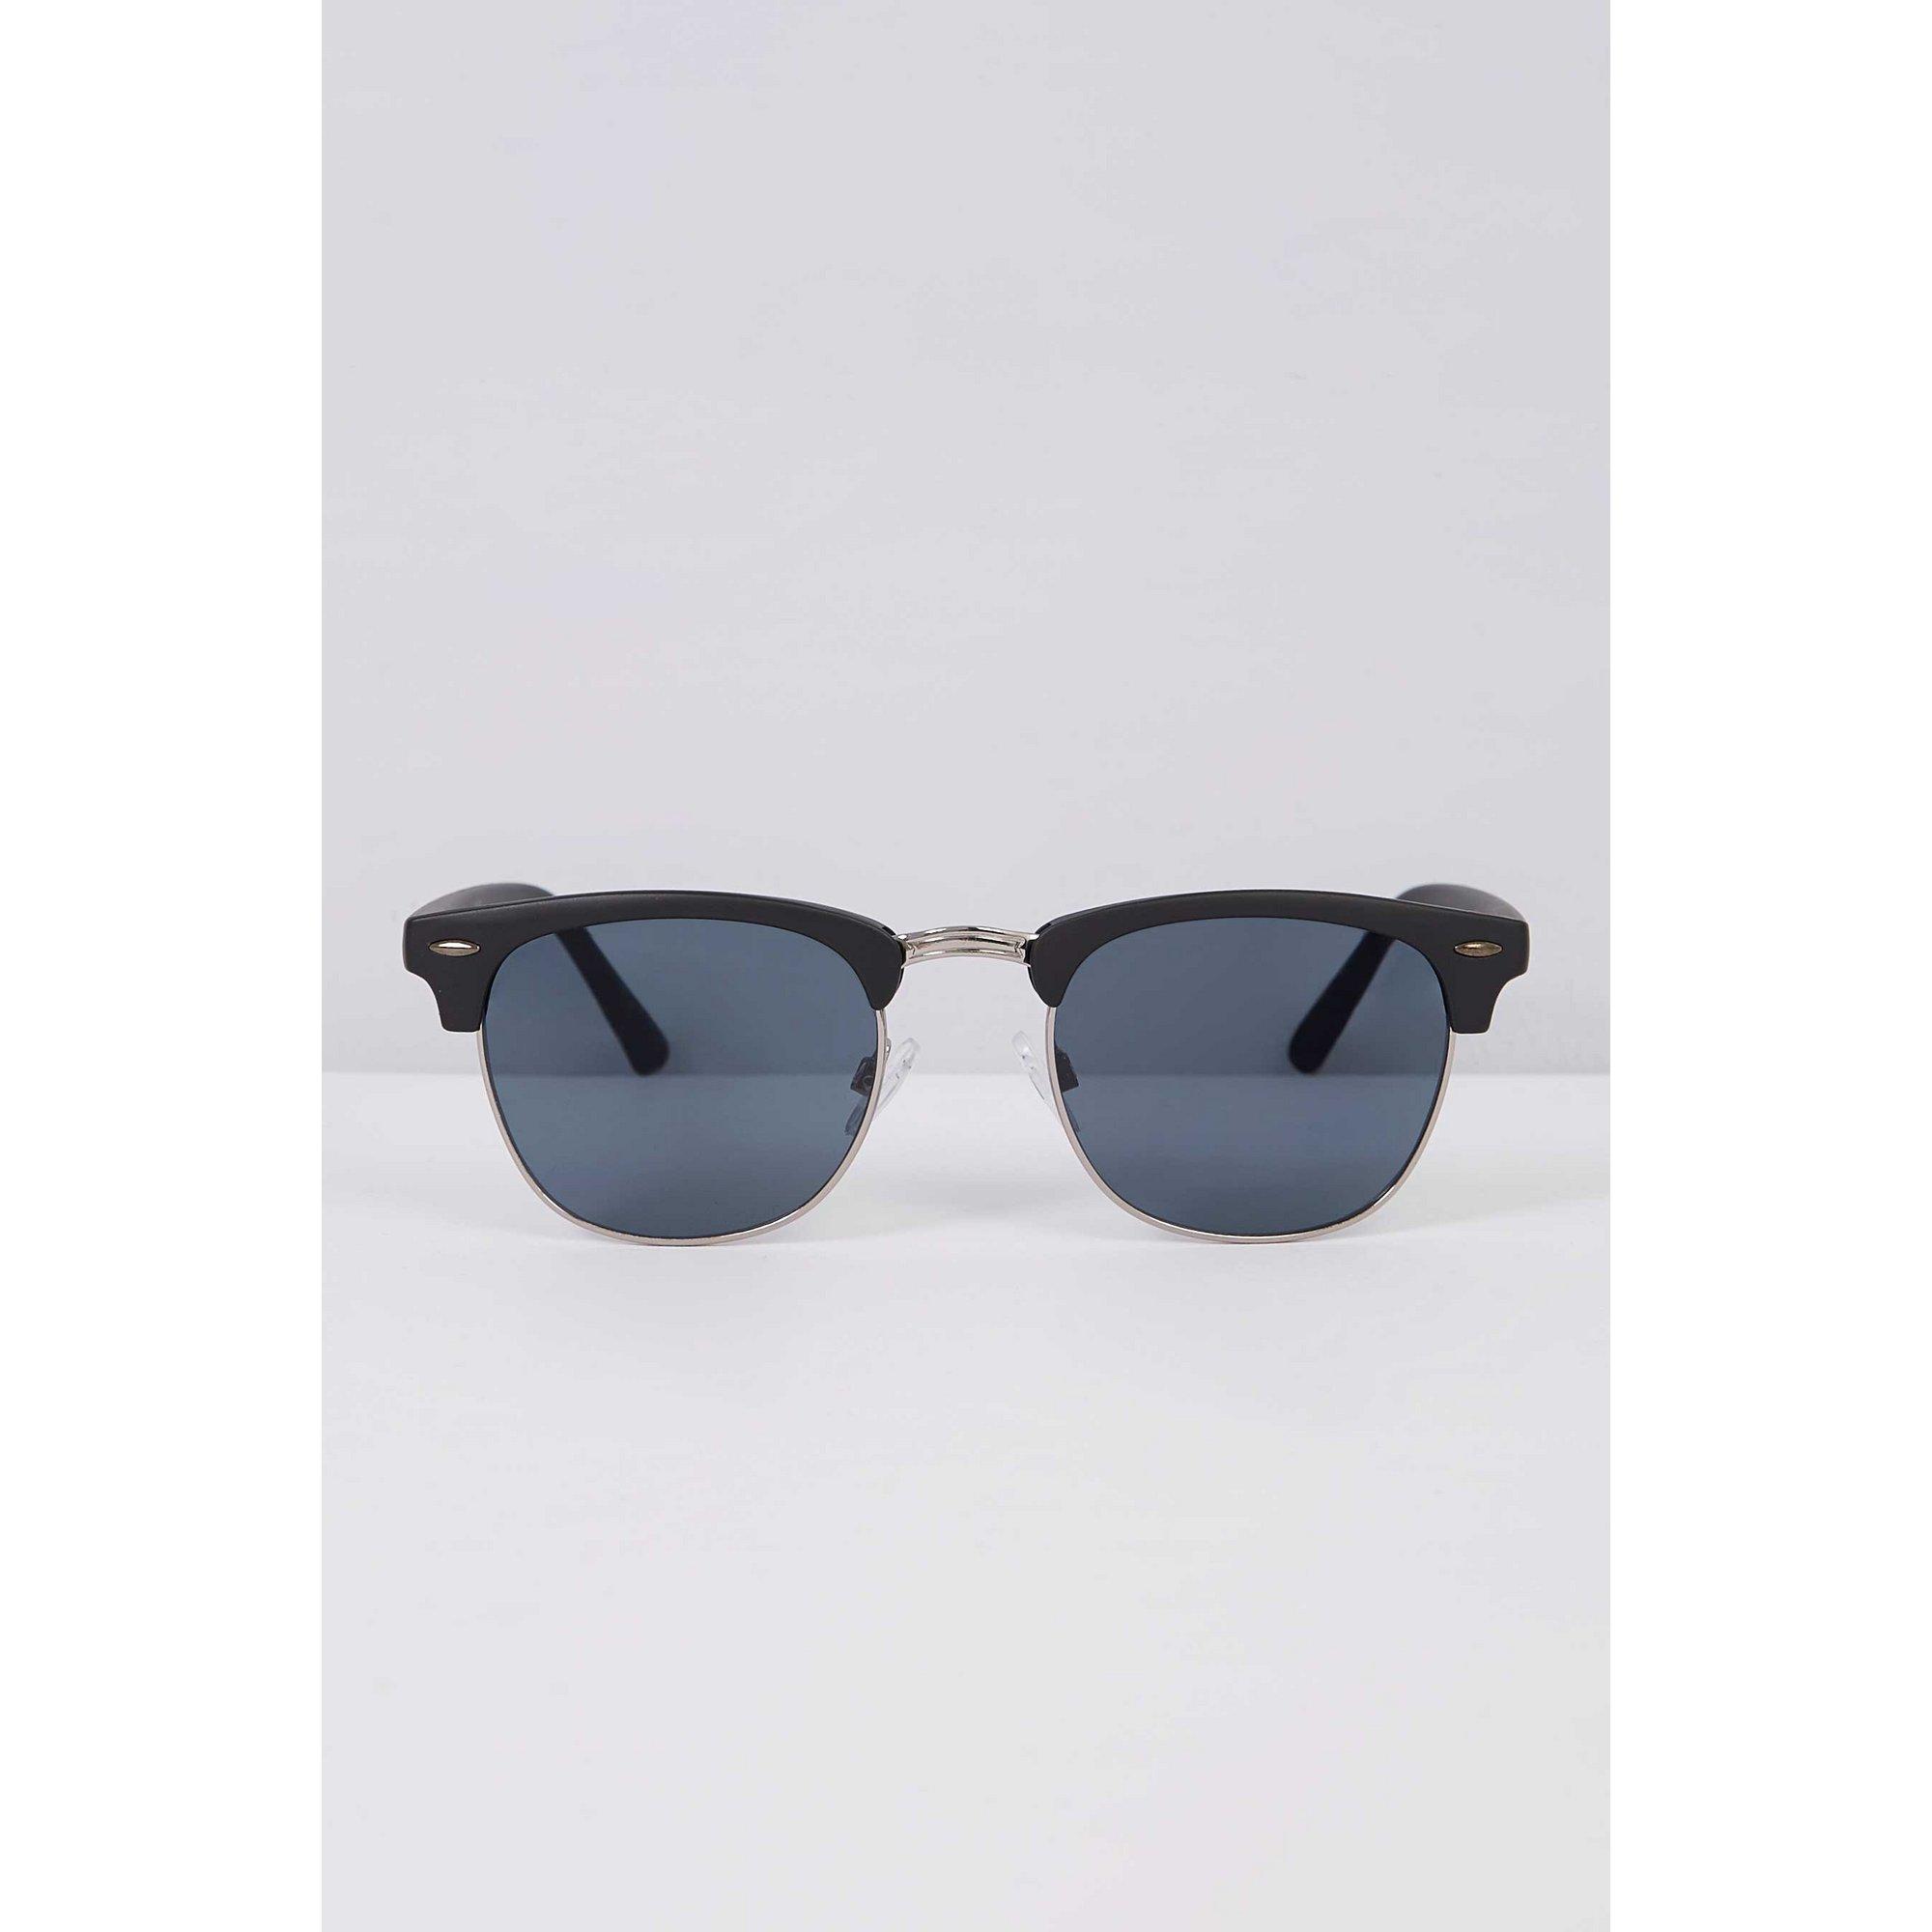 Image of Jack and Jones Ryder Sunglasses